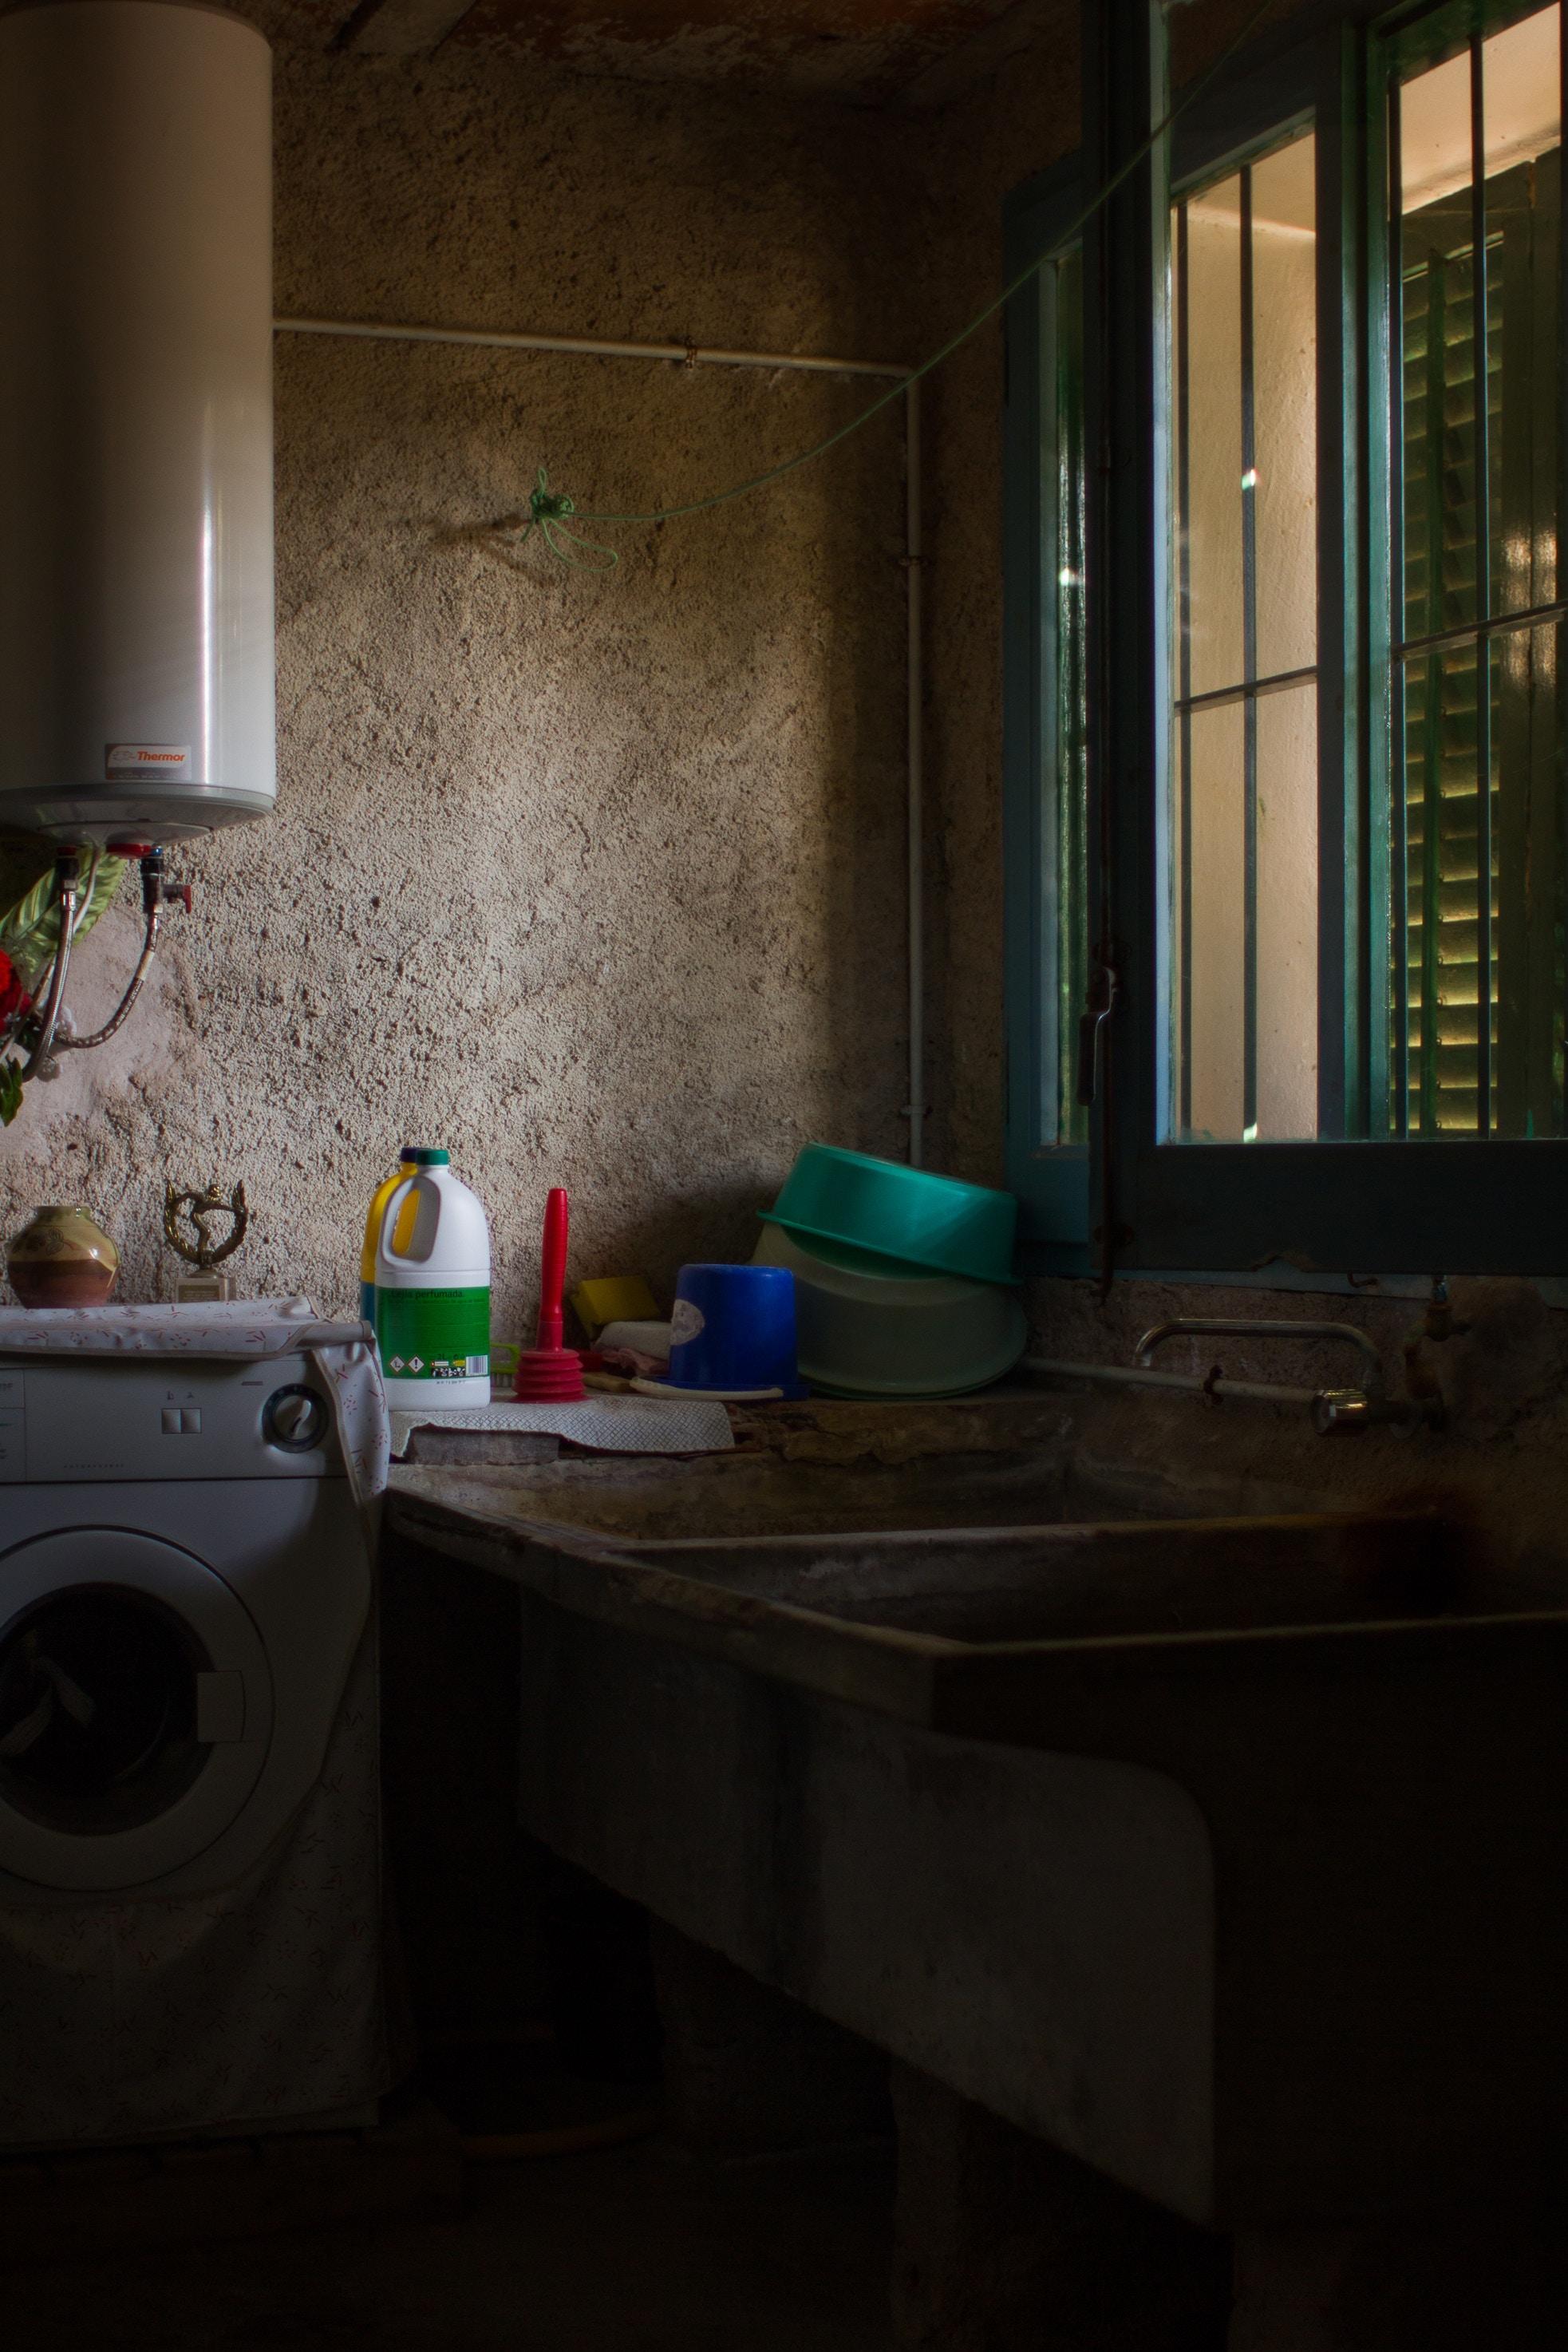 Photo by Pau Casals on Unsplash